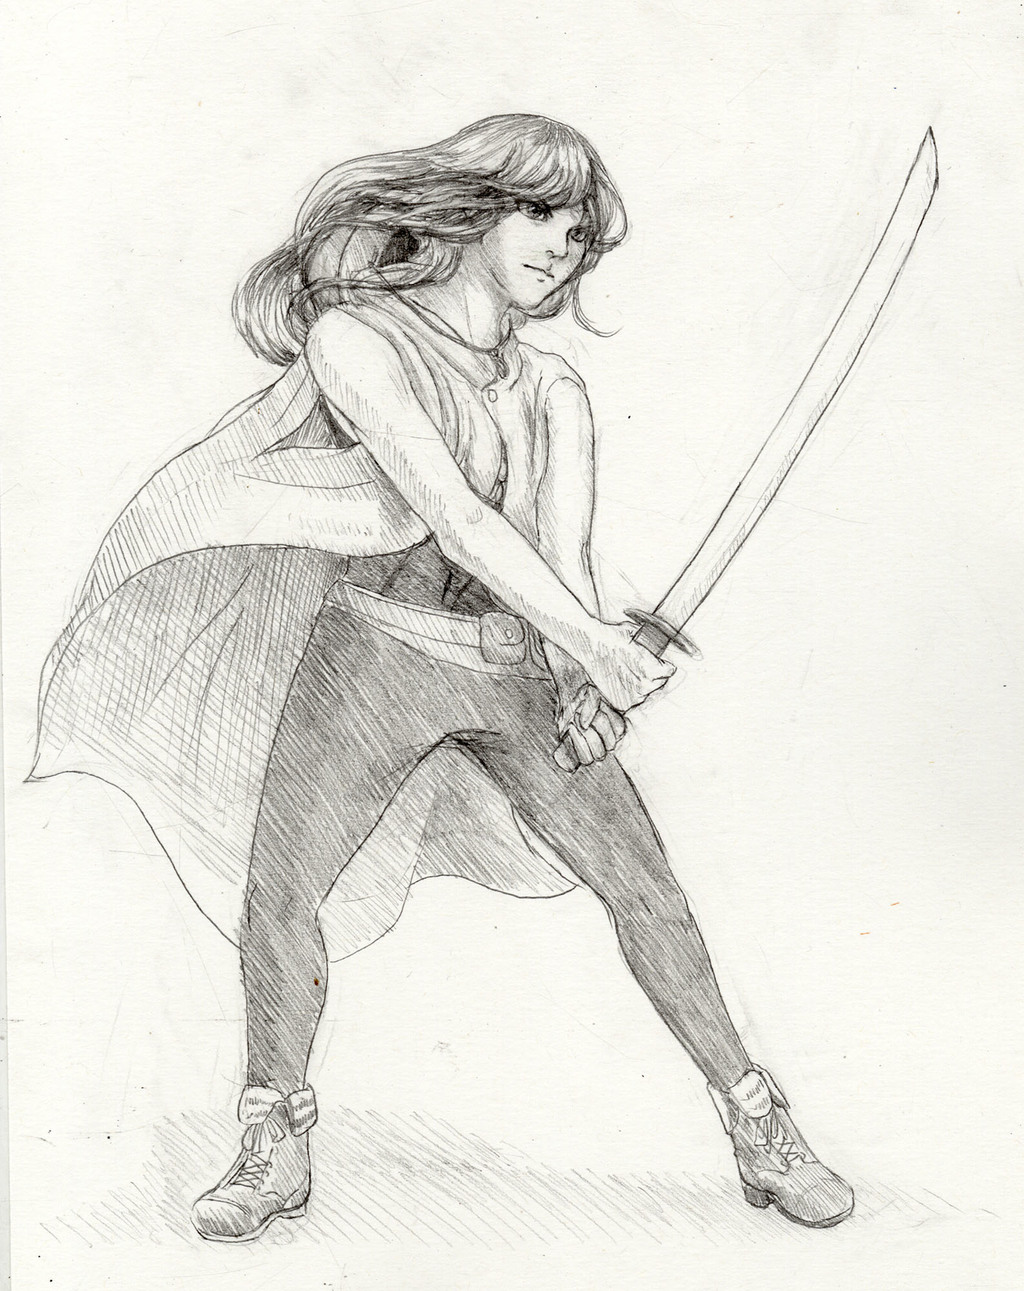 Most recent image: Hayashi D Ren Sketch